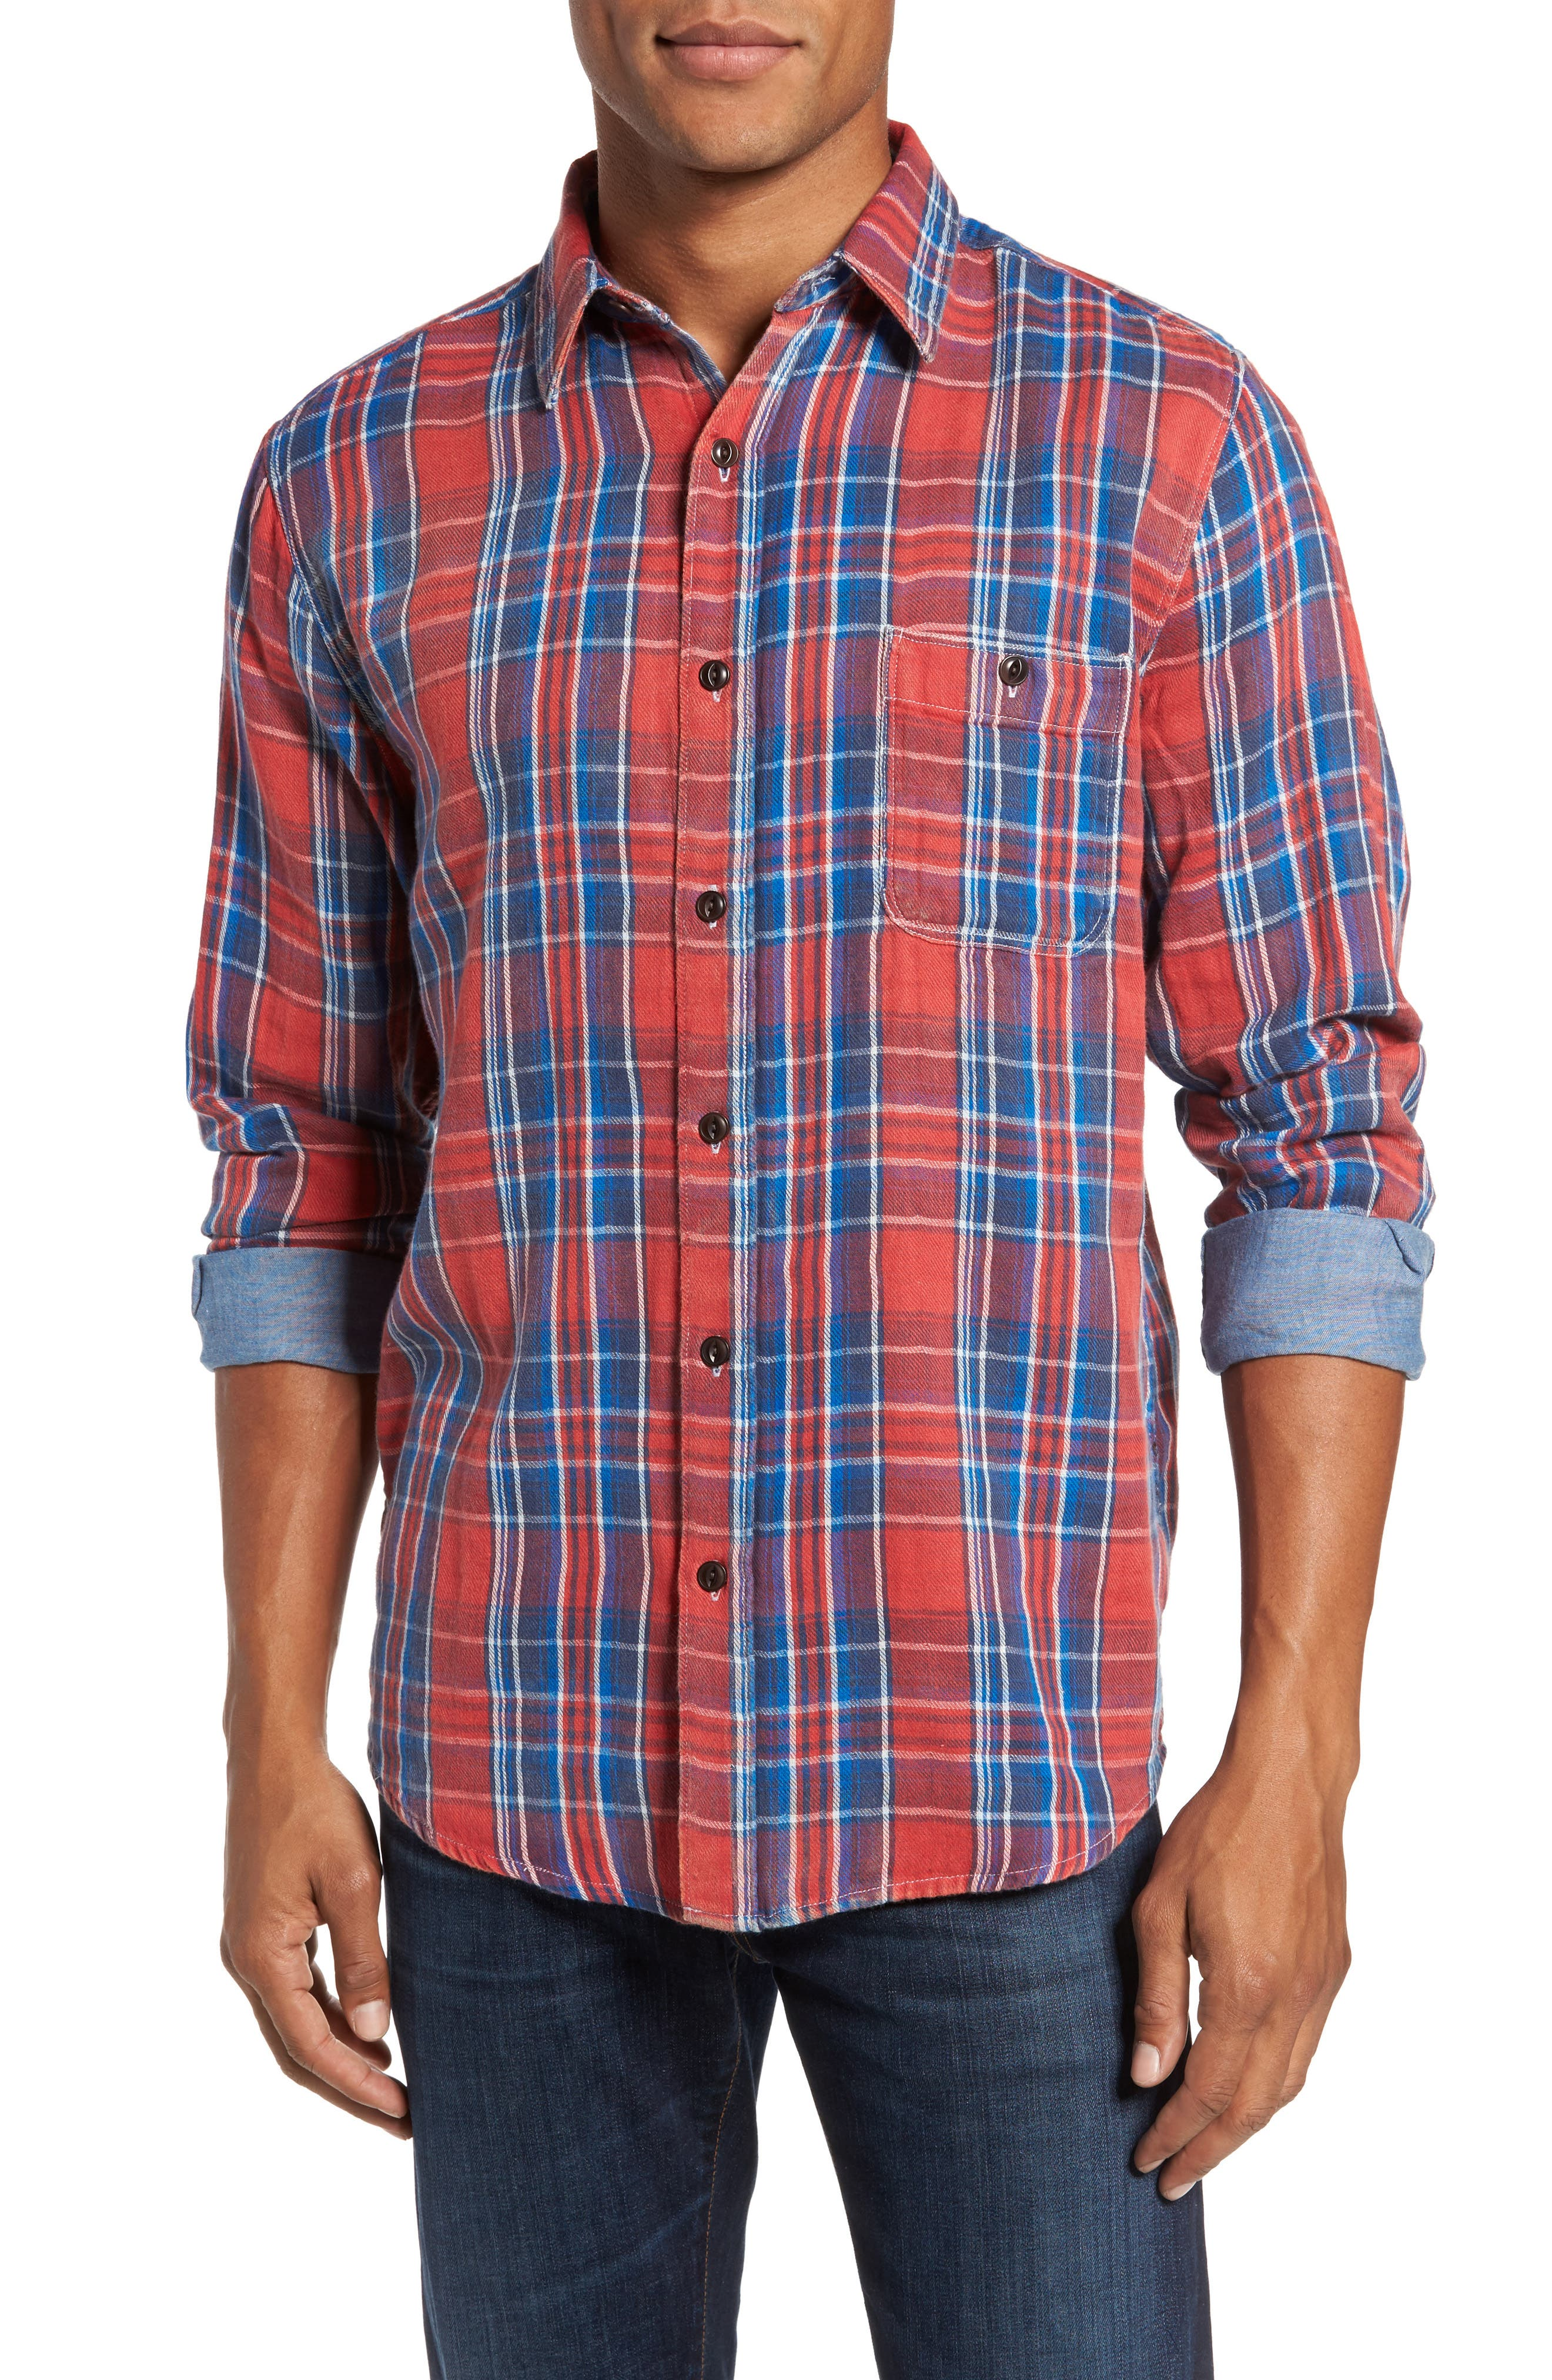 Alternate Image 1 Selected - Faherty Plaid Sport Shirt